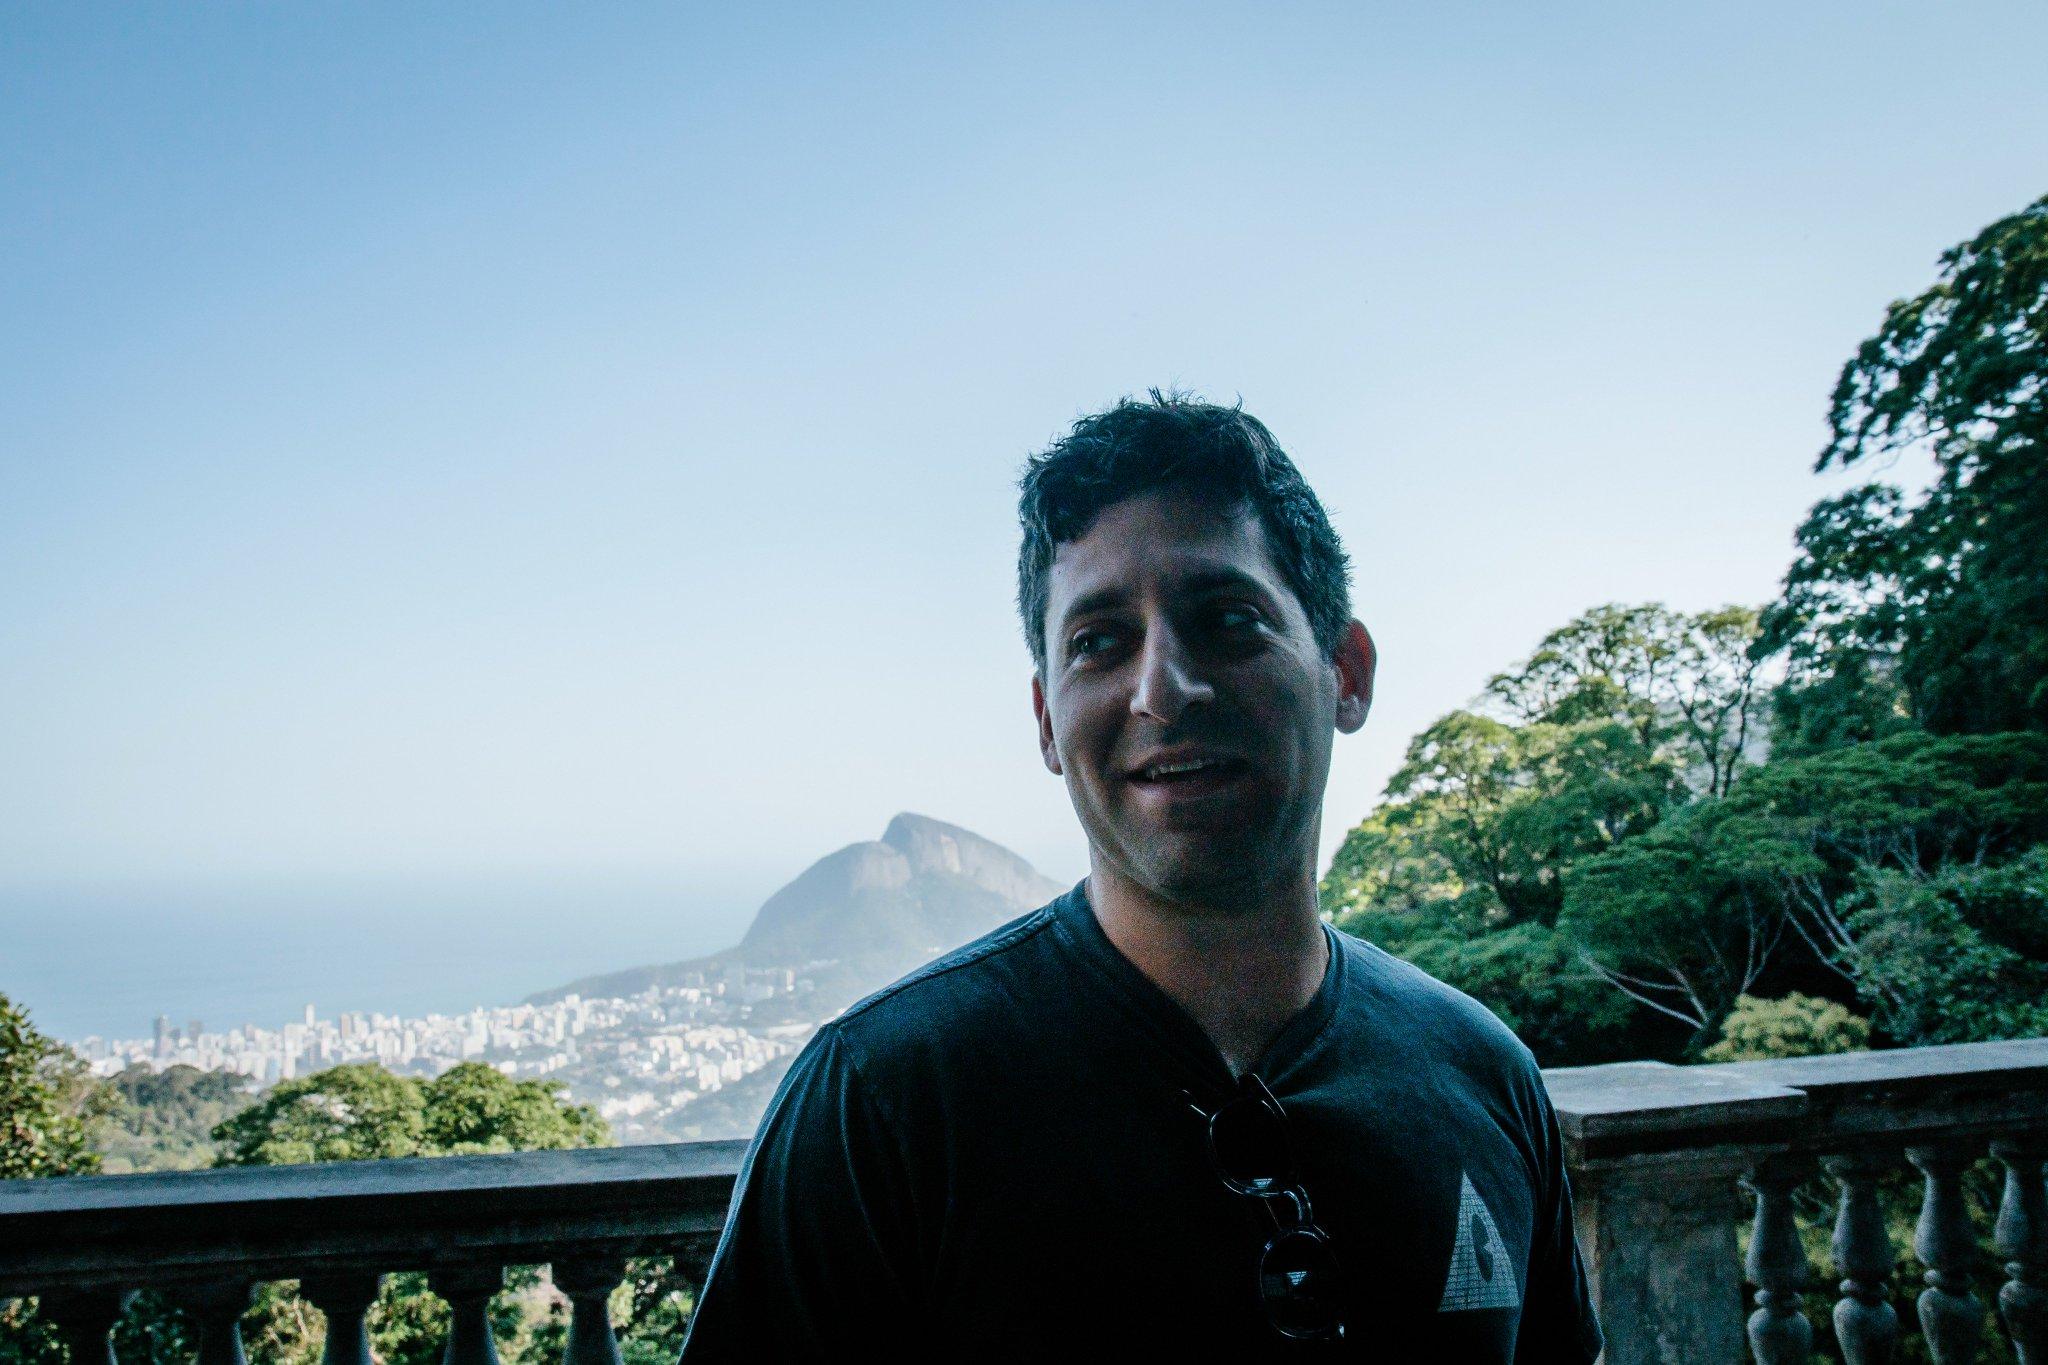 Rio ✌️ https://t.co/QIpFDziICD